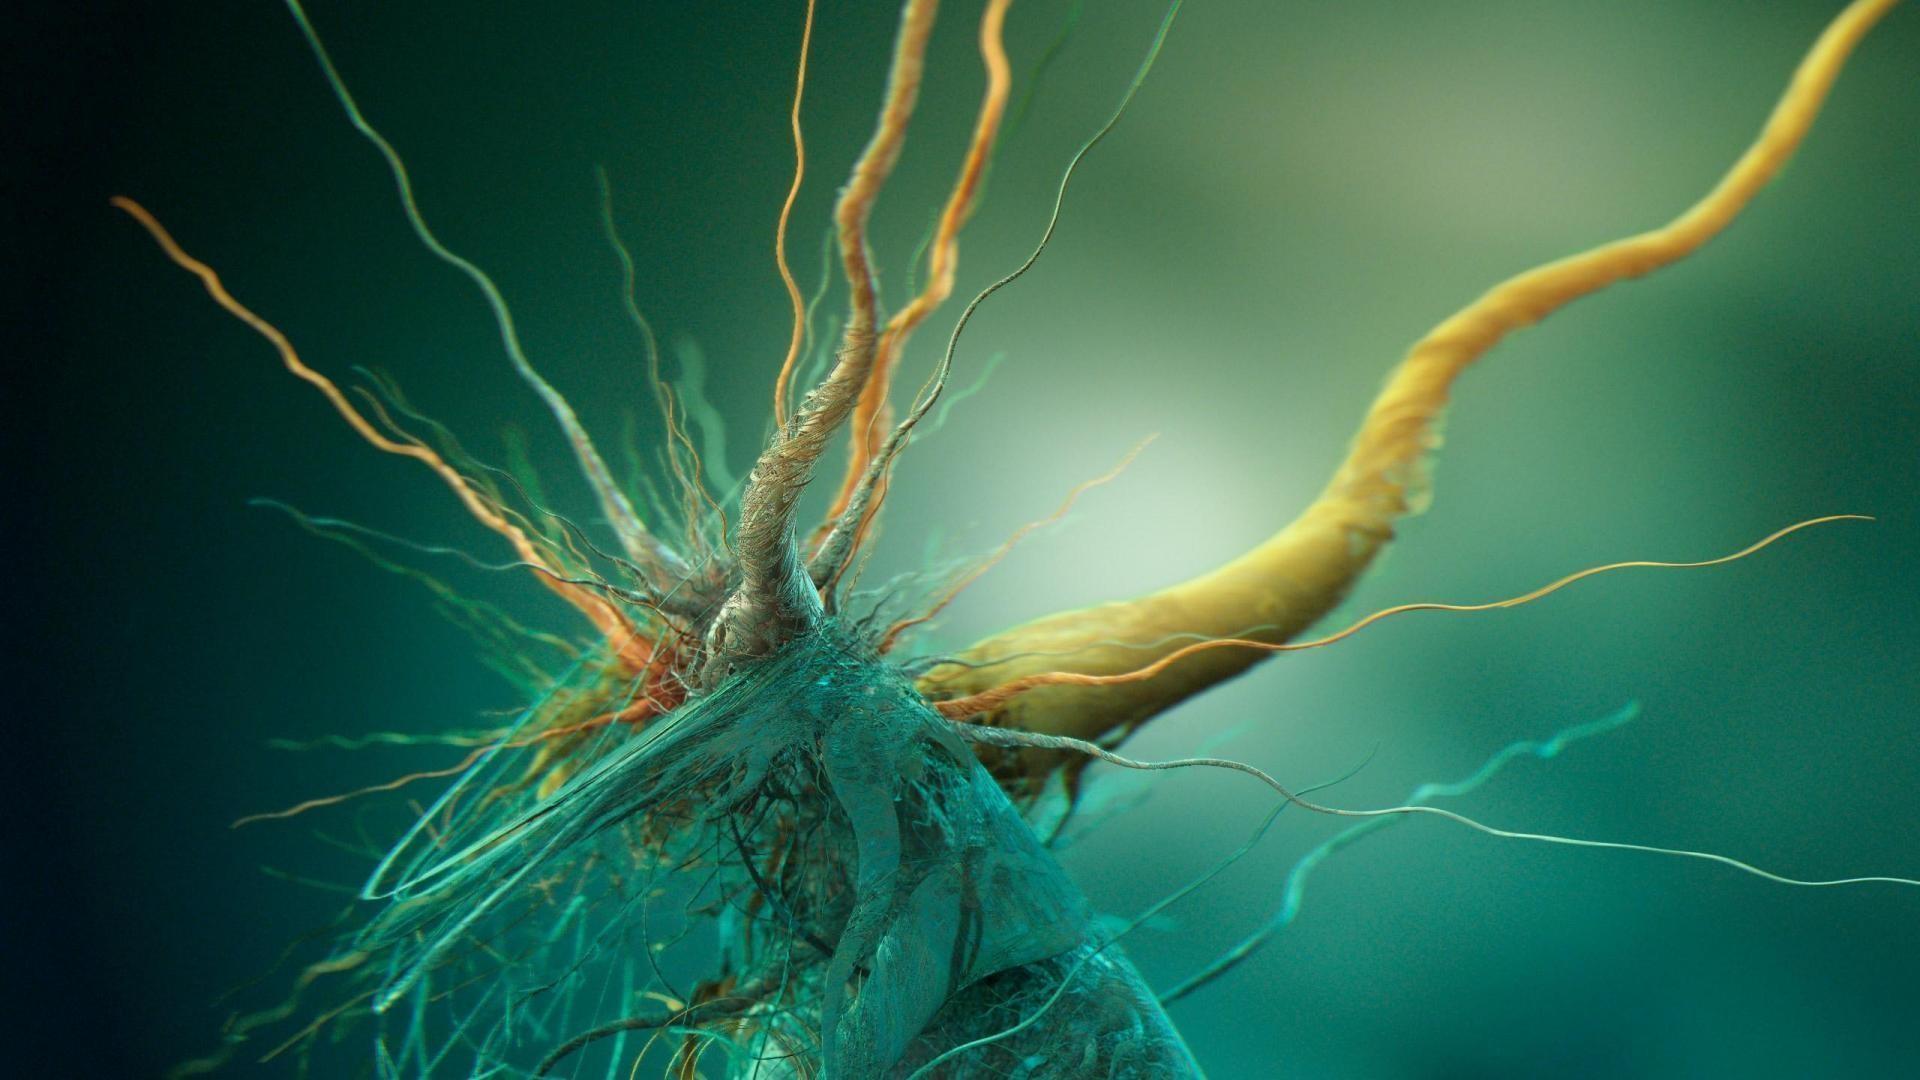 Cells Biology Brains Abstract HD Wallpapers, Desktop Backgrounds .